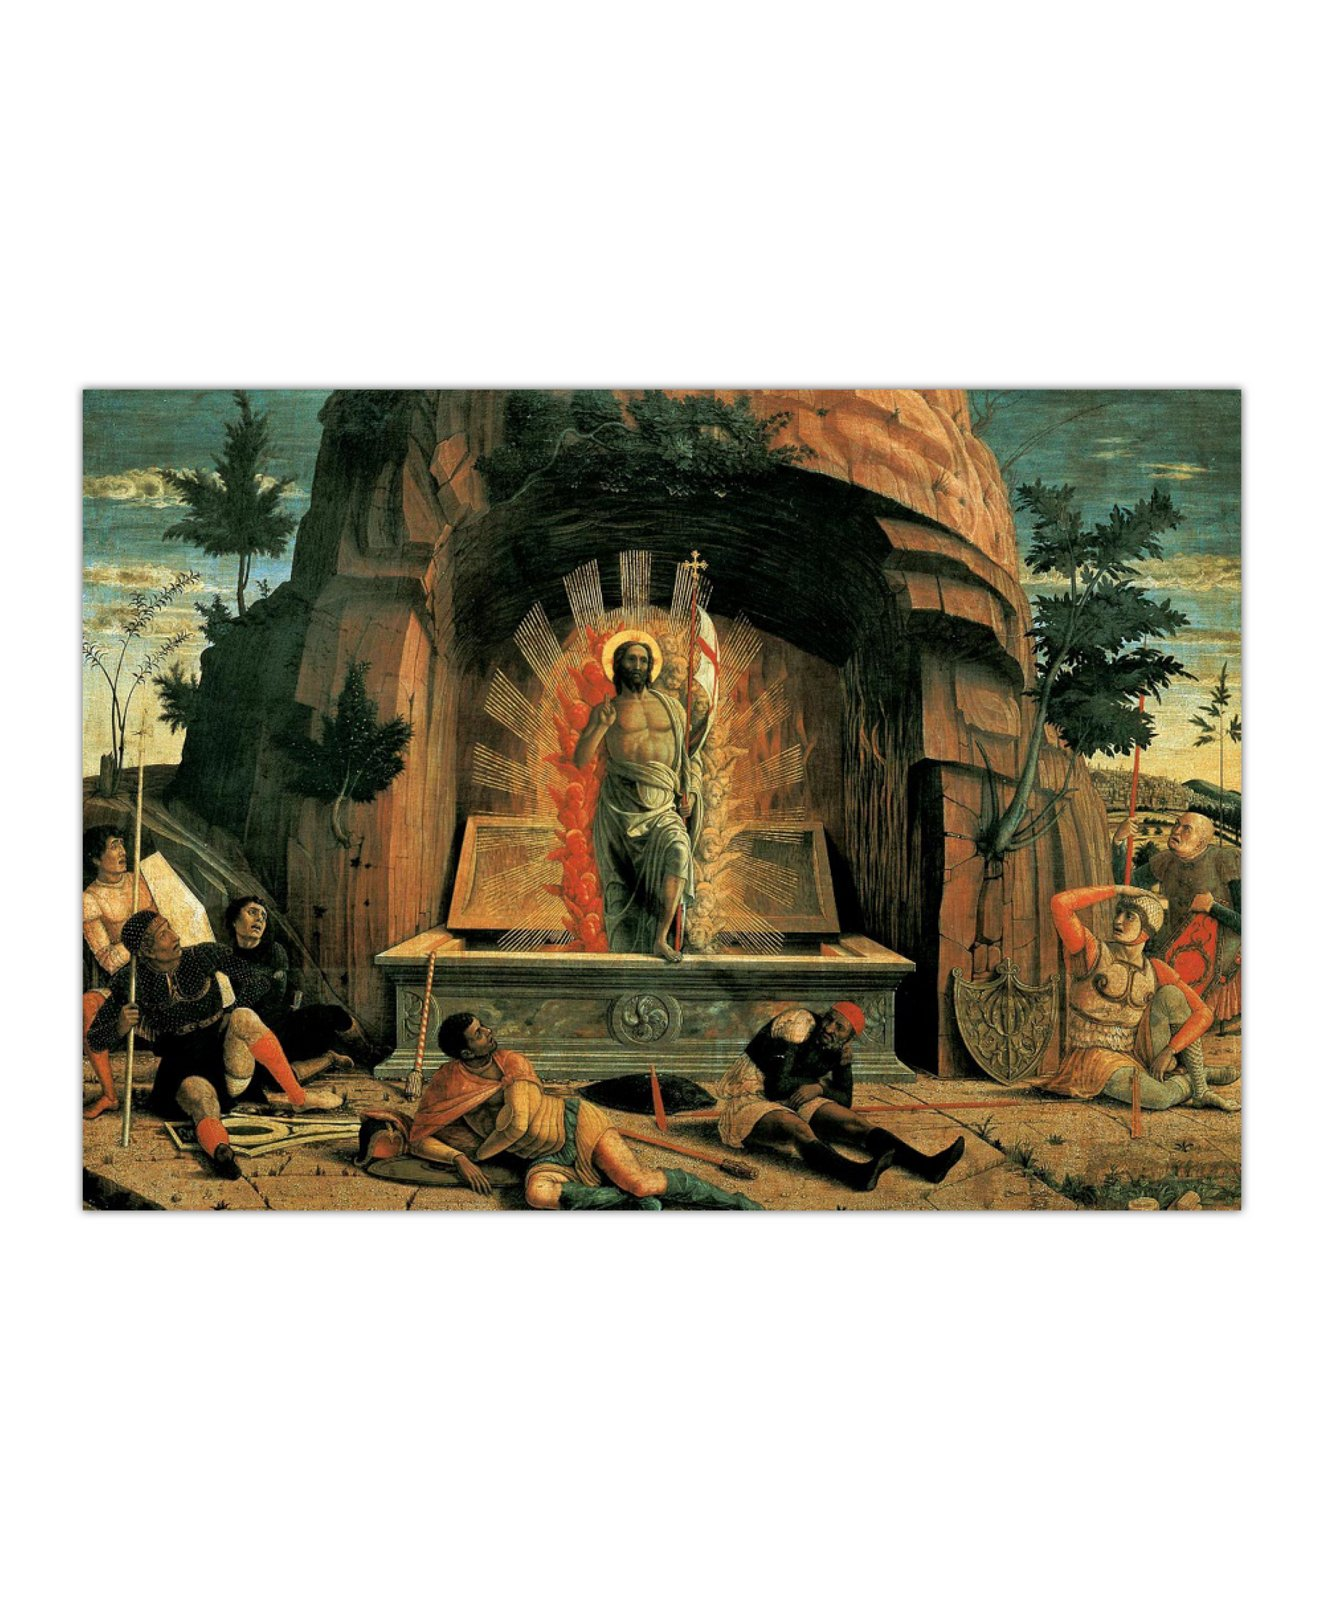 Andrea Mantegna, Zmartwychwstanie, 1459 2